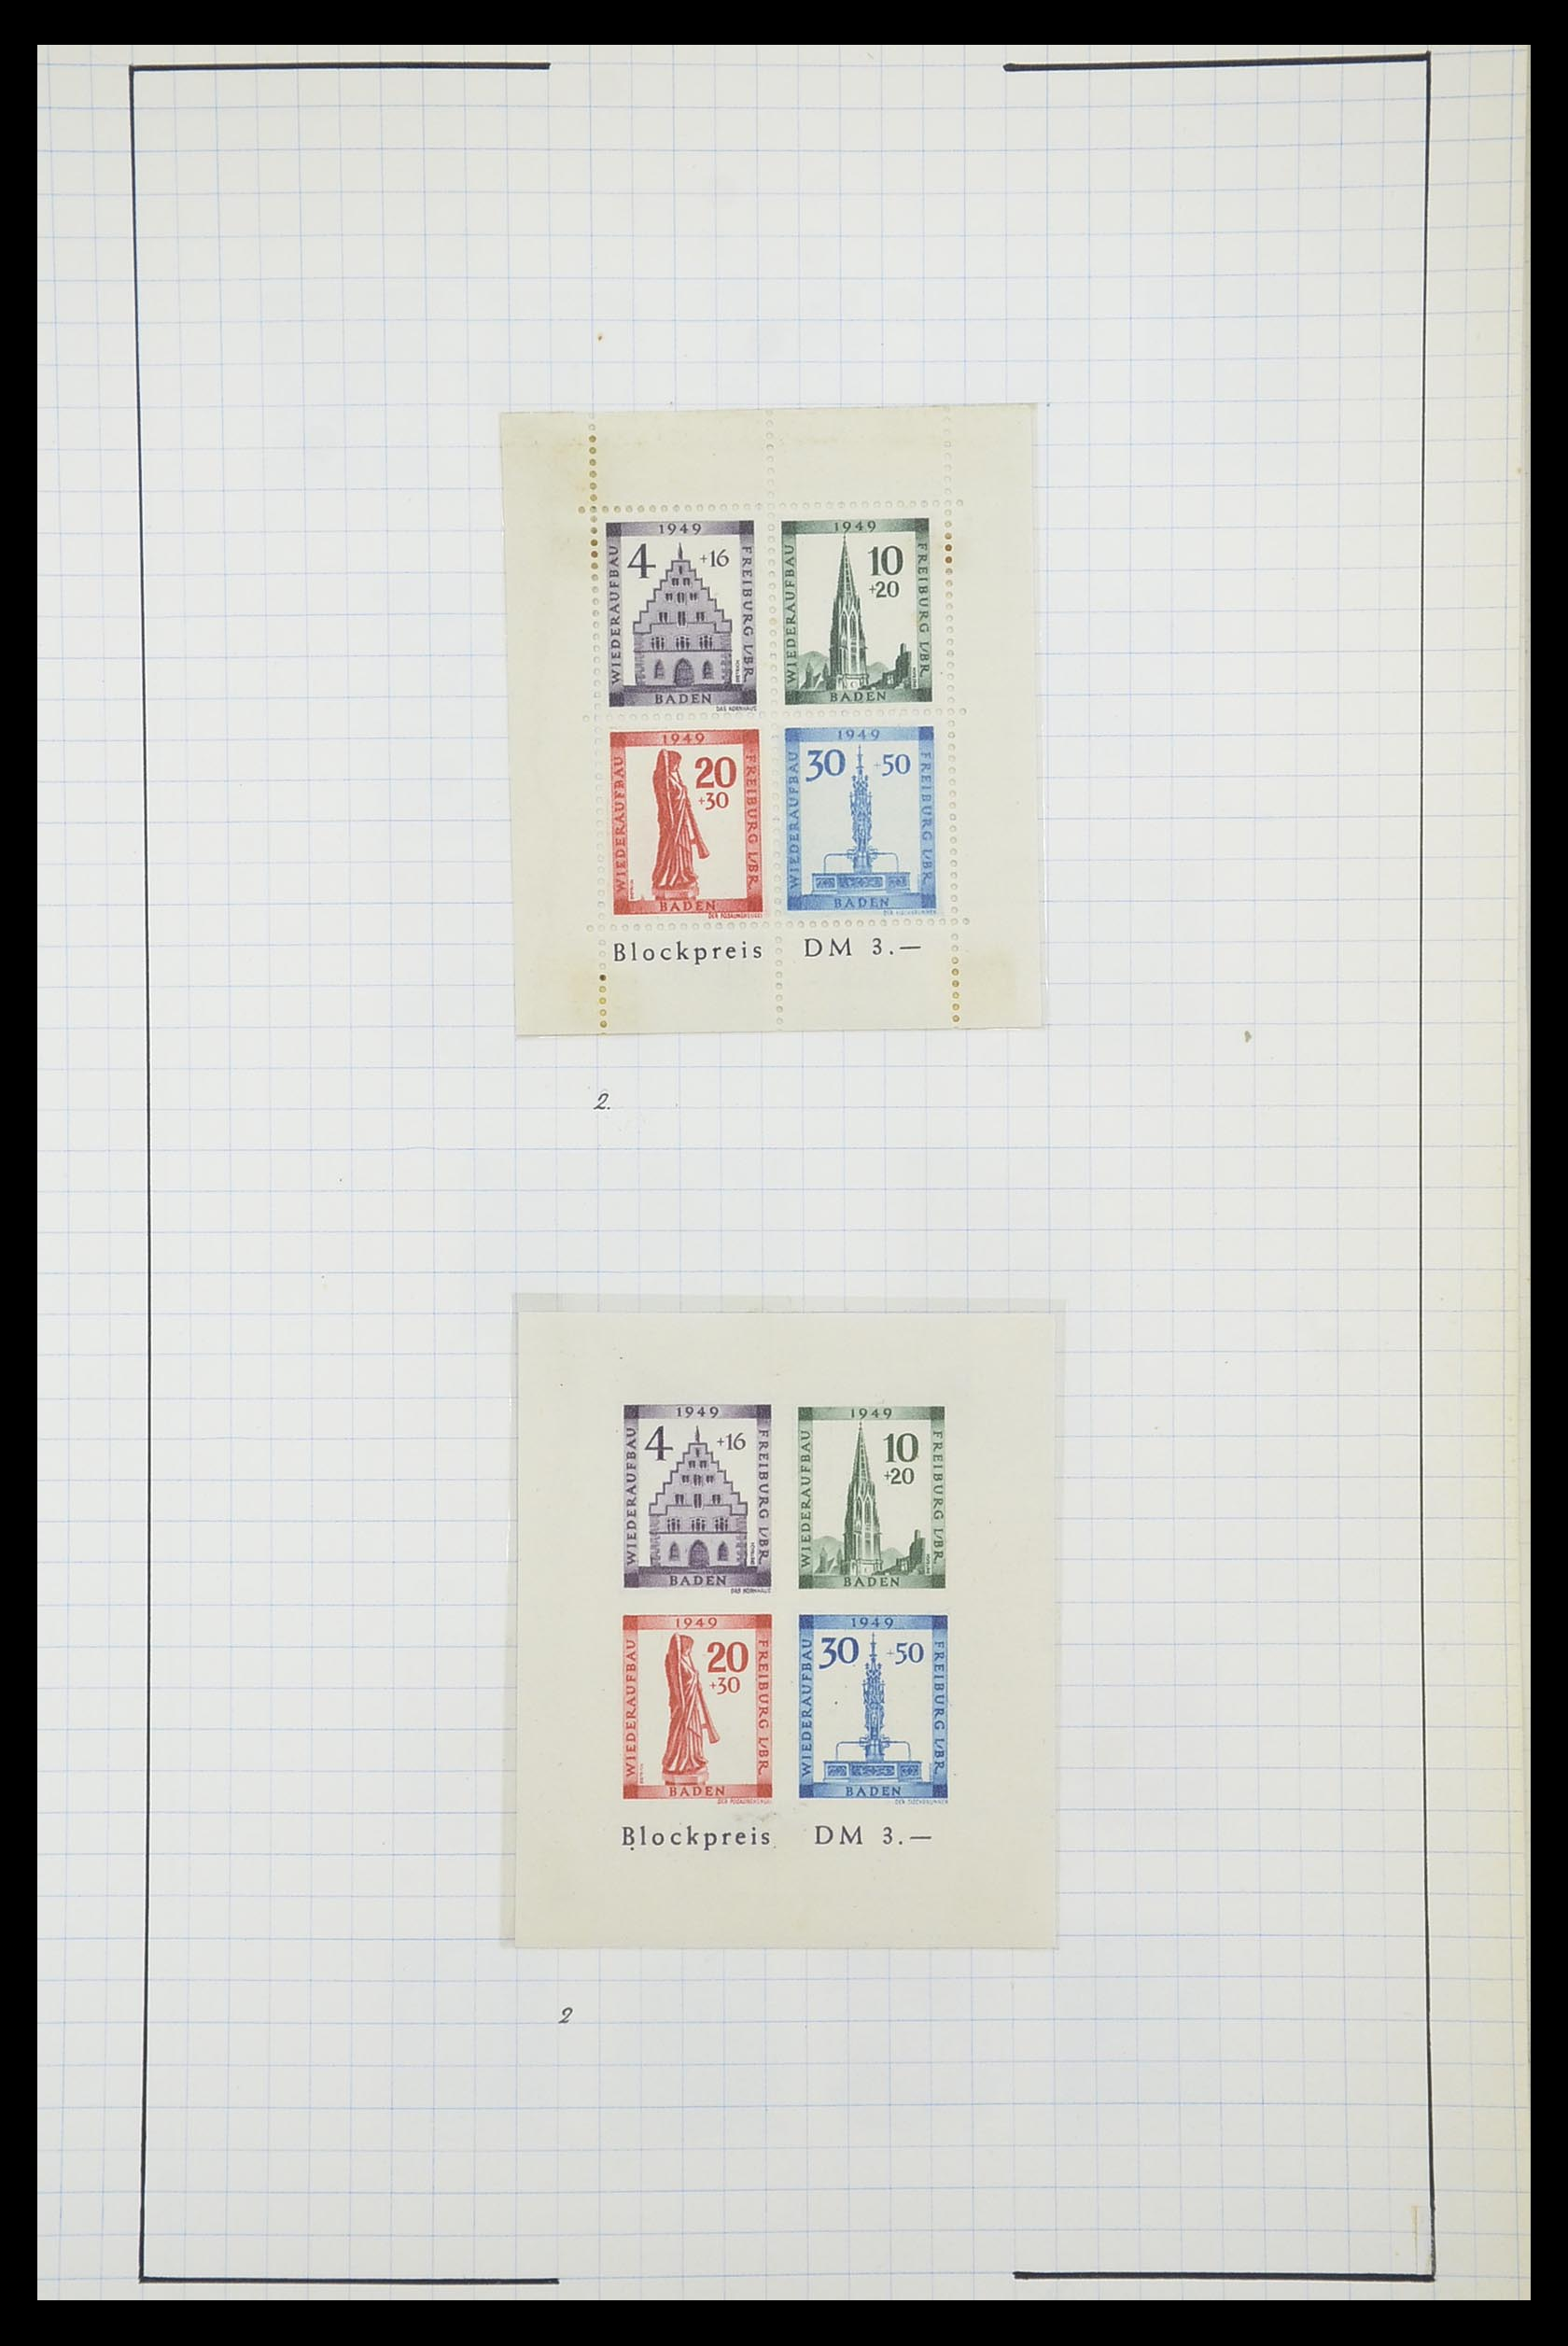 33864 013 - Postzegelverzameling 33864 Franse Zone 1945-1949.